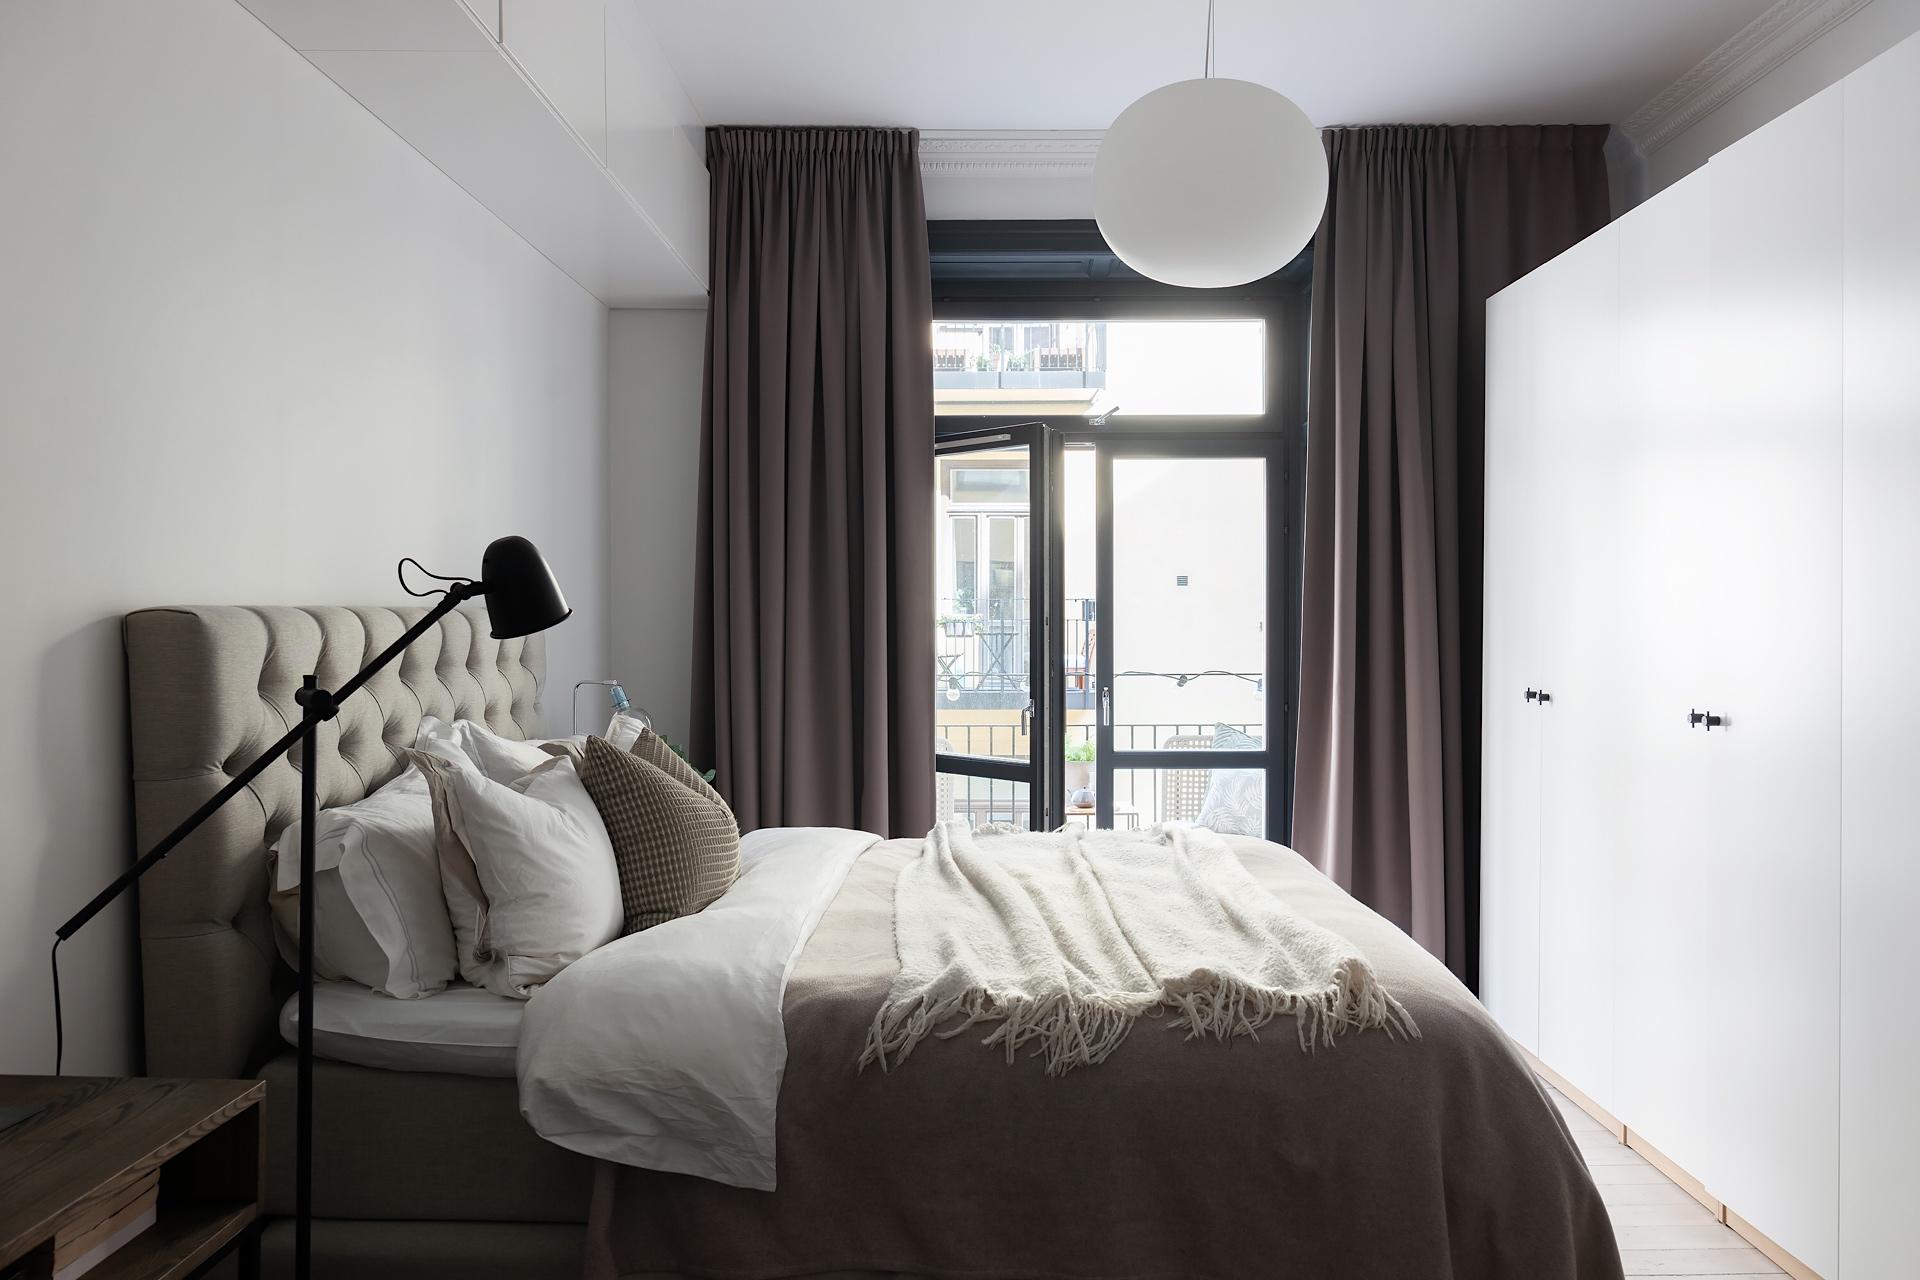 30638 bedroom wardrobe